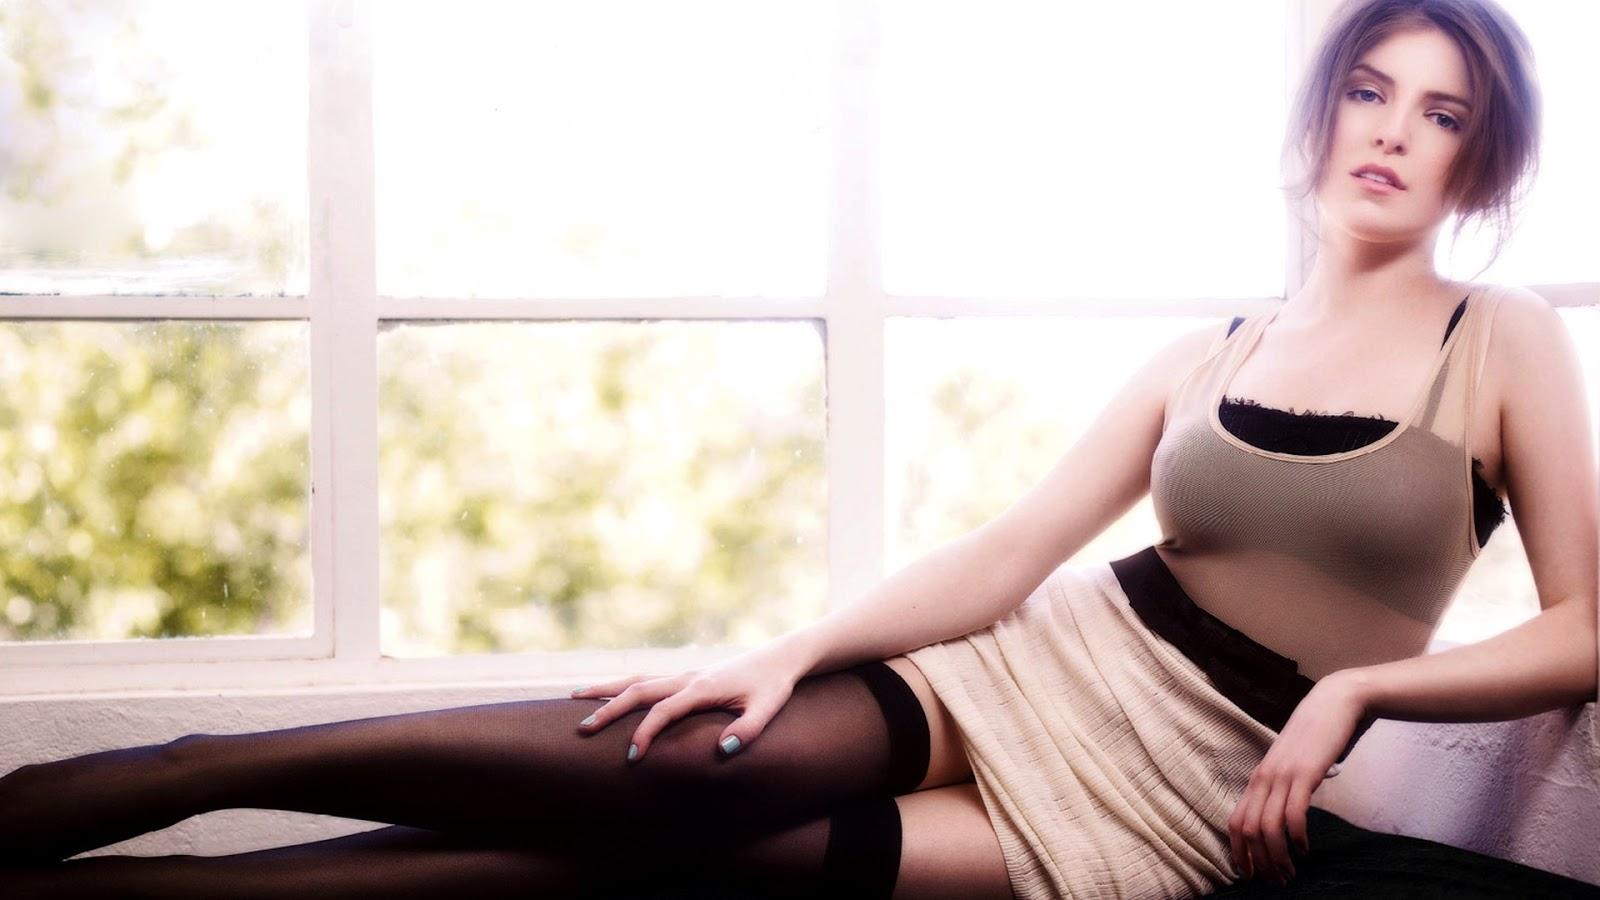 Anna Kendrick Beauty